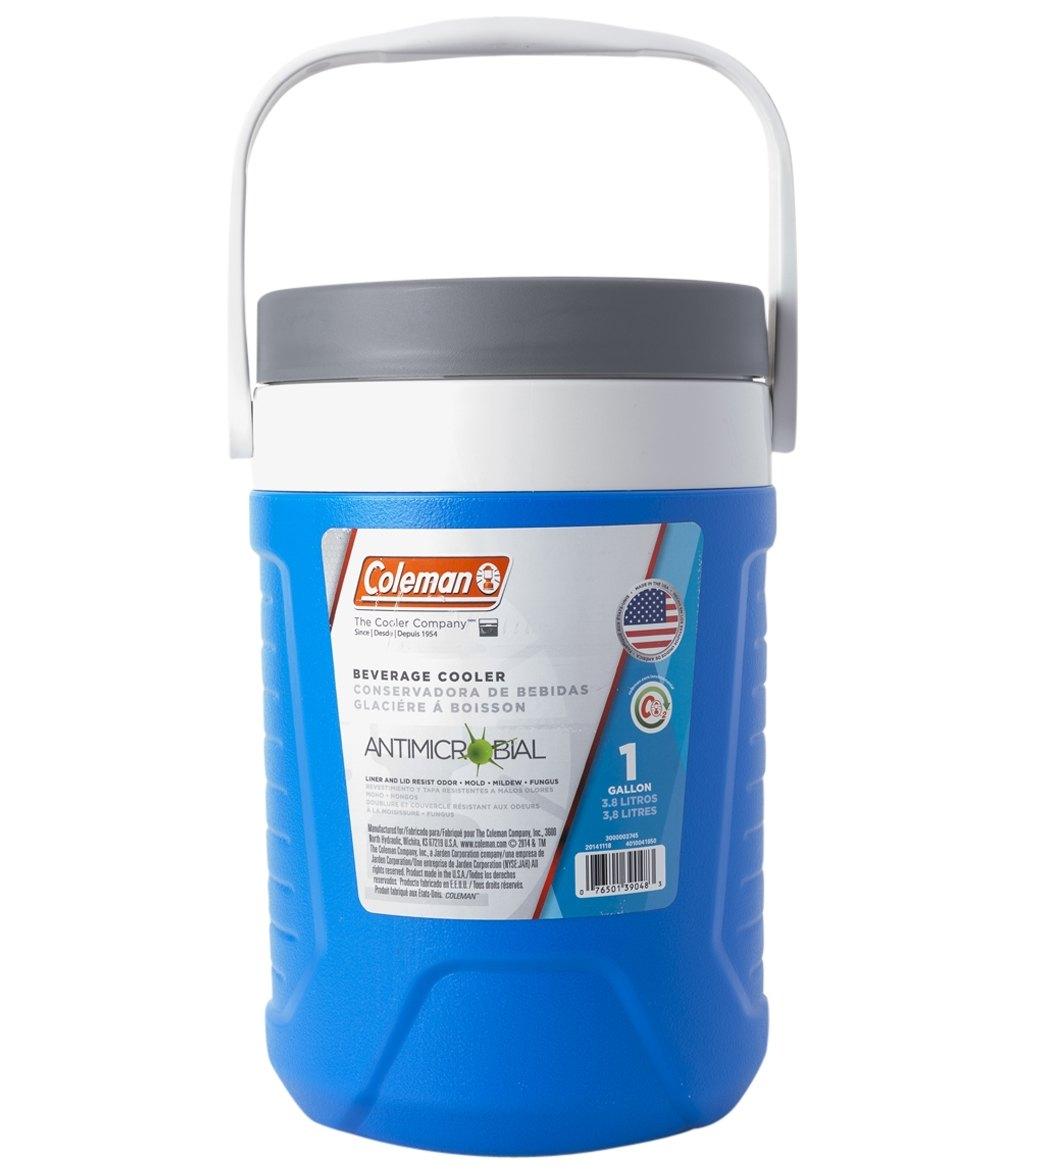 coleman antimicrobial 1 gallon